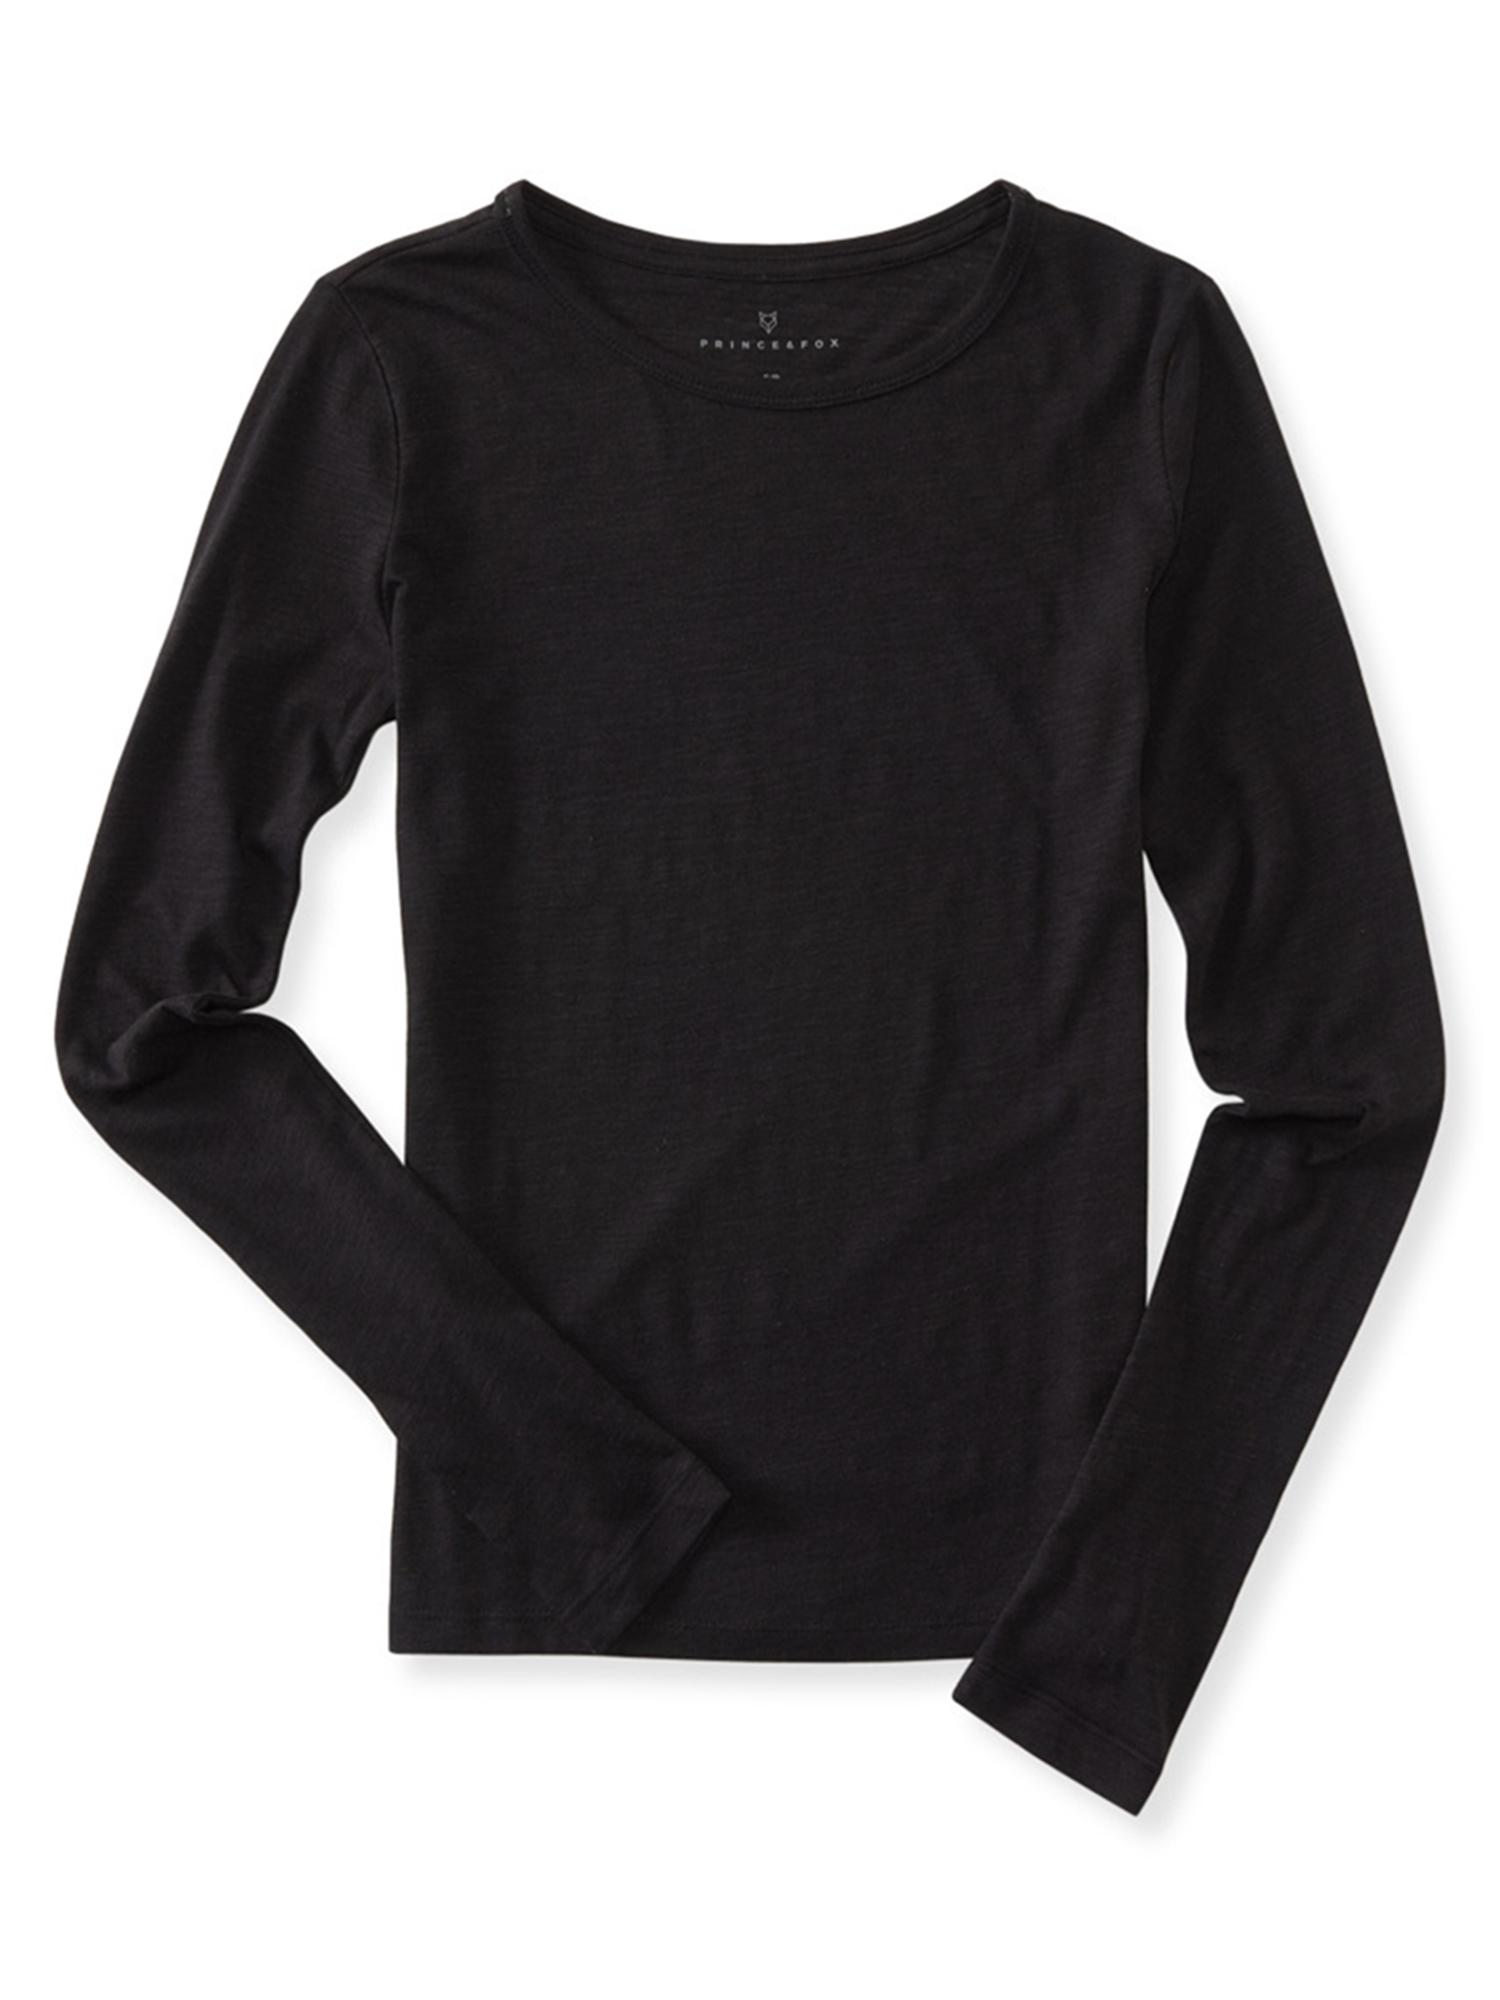 Aeropostale Juniors Long Sleeve Basic T-Shirt